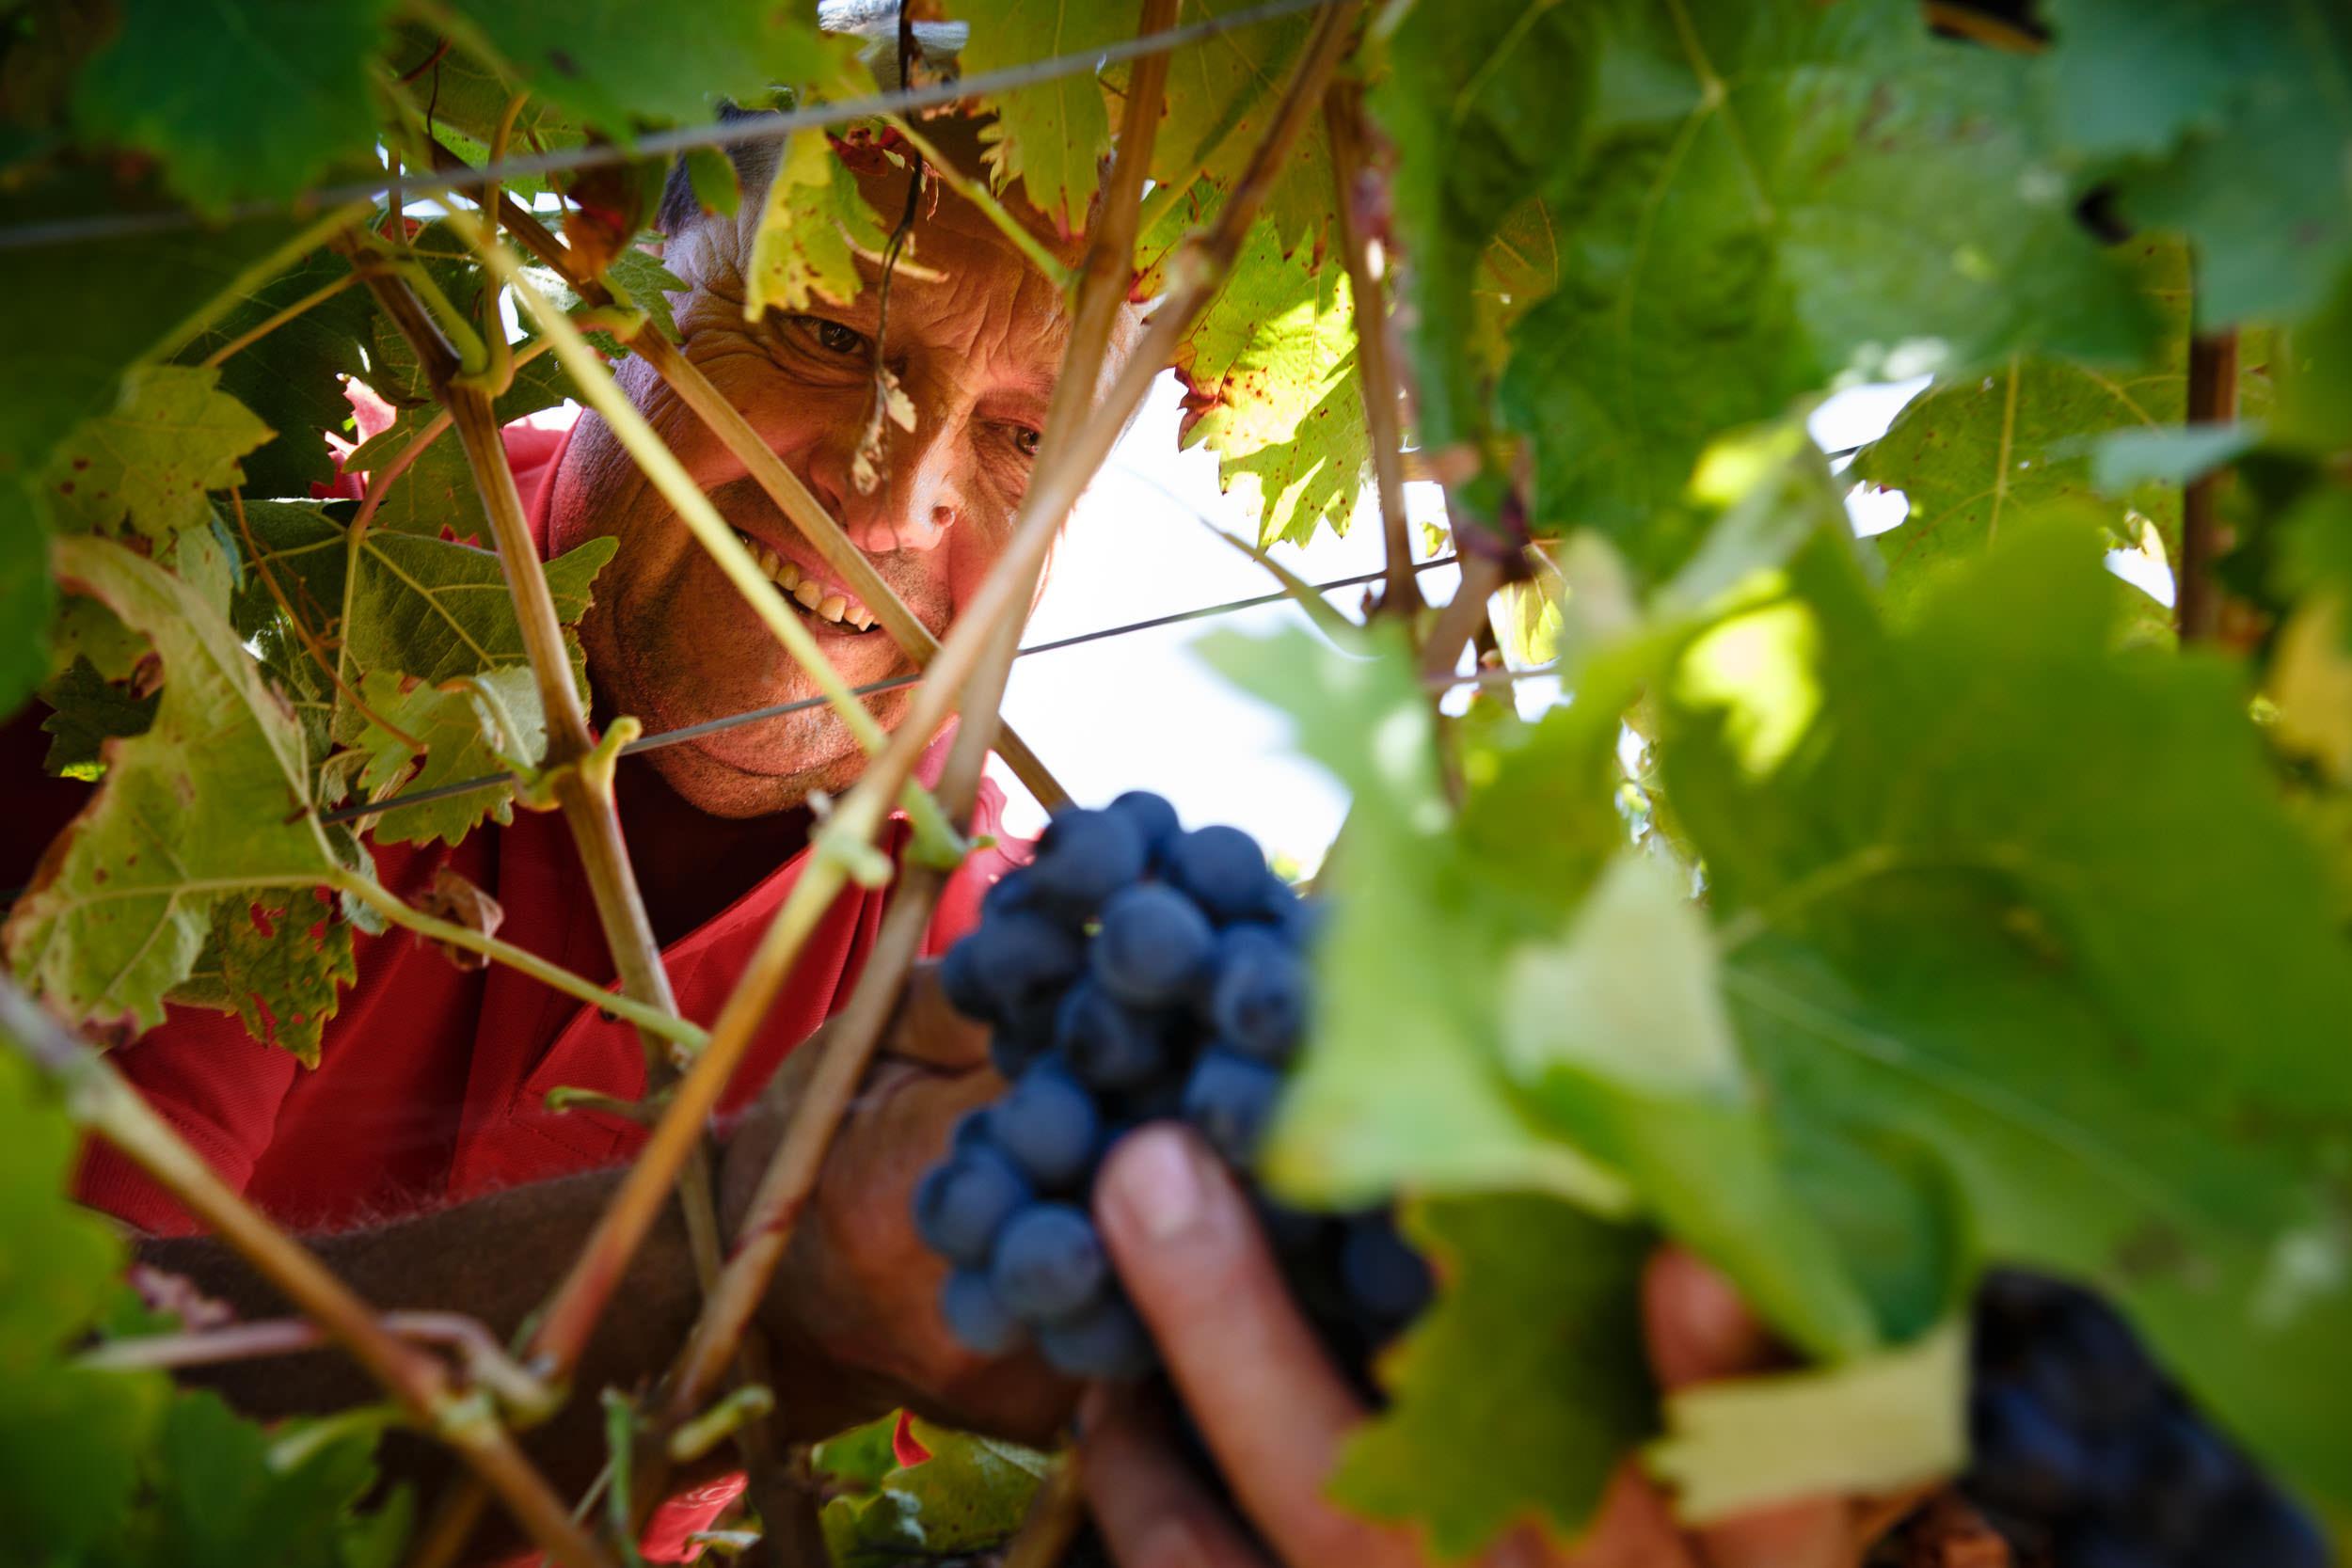 Wine Photography Grape Harvest in Ribera del Duero Toro and Rioja Alavesa Spain - James Sturcke  Photographer | sturcke.org_006.jpg